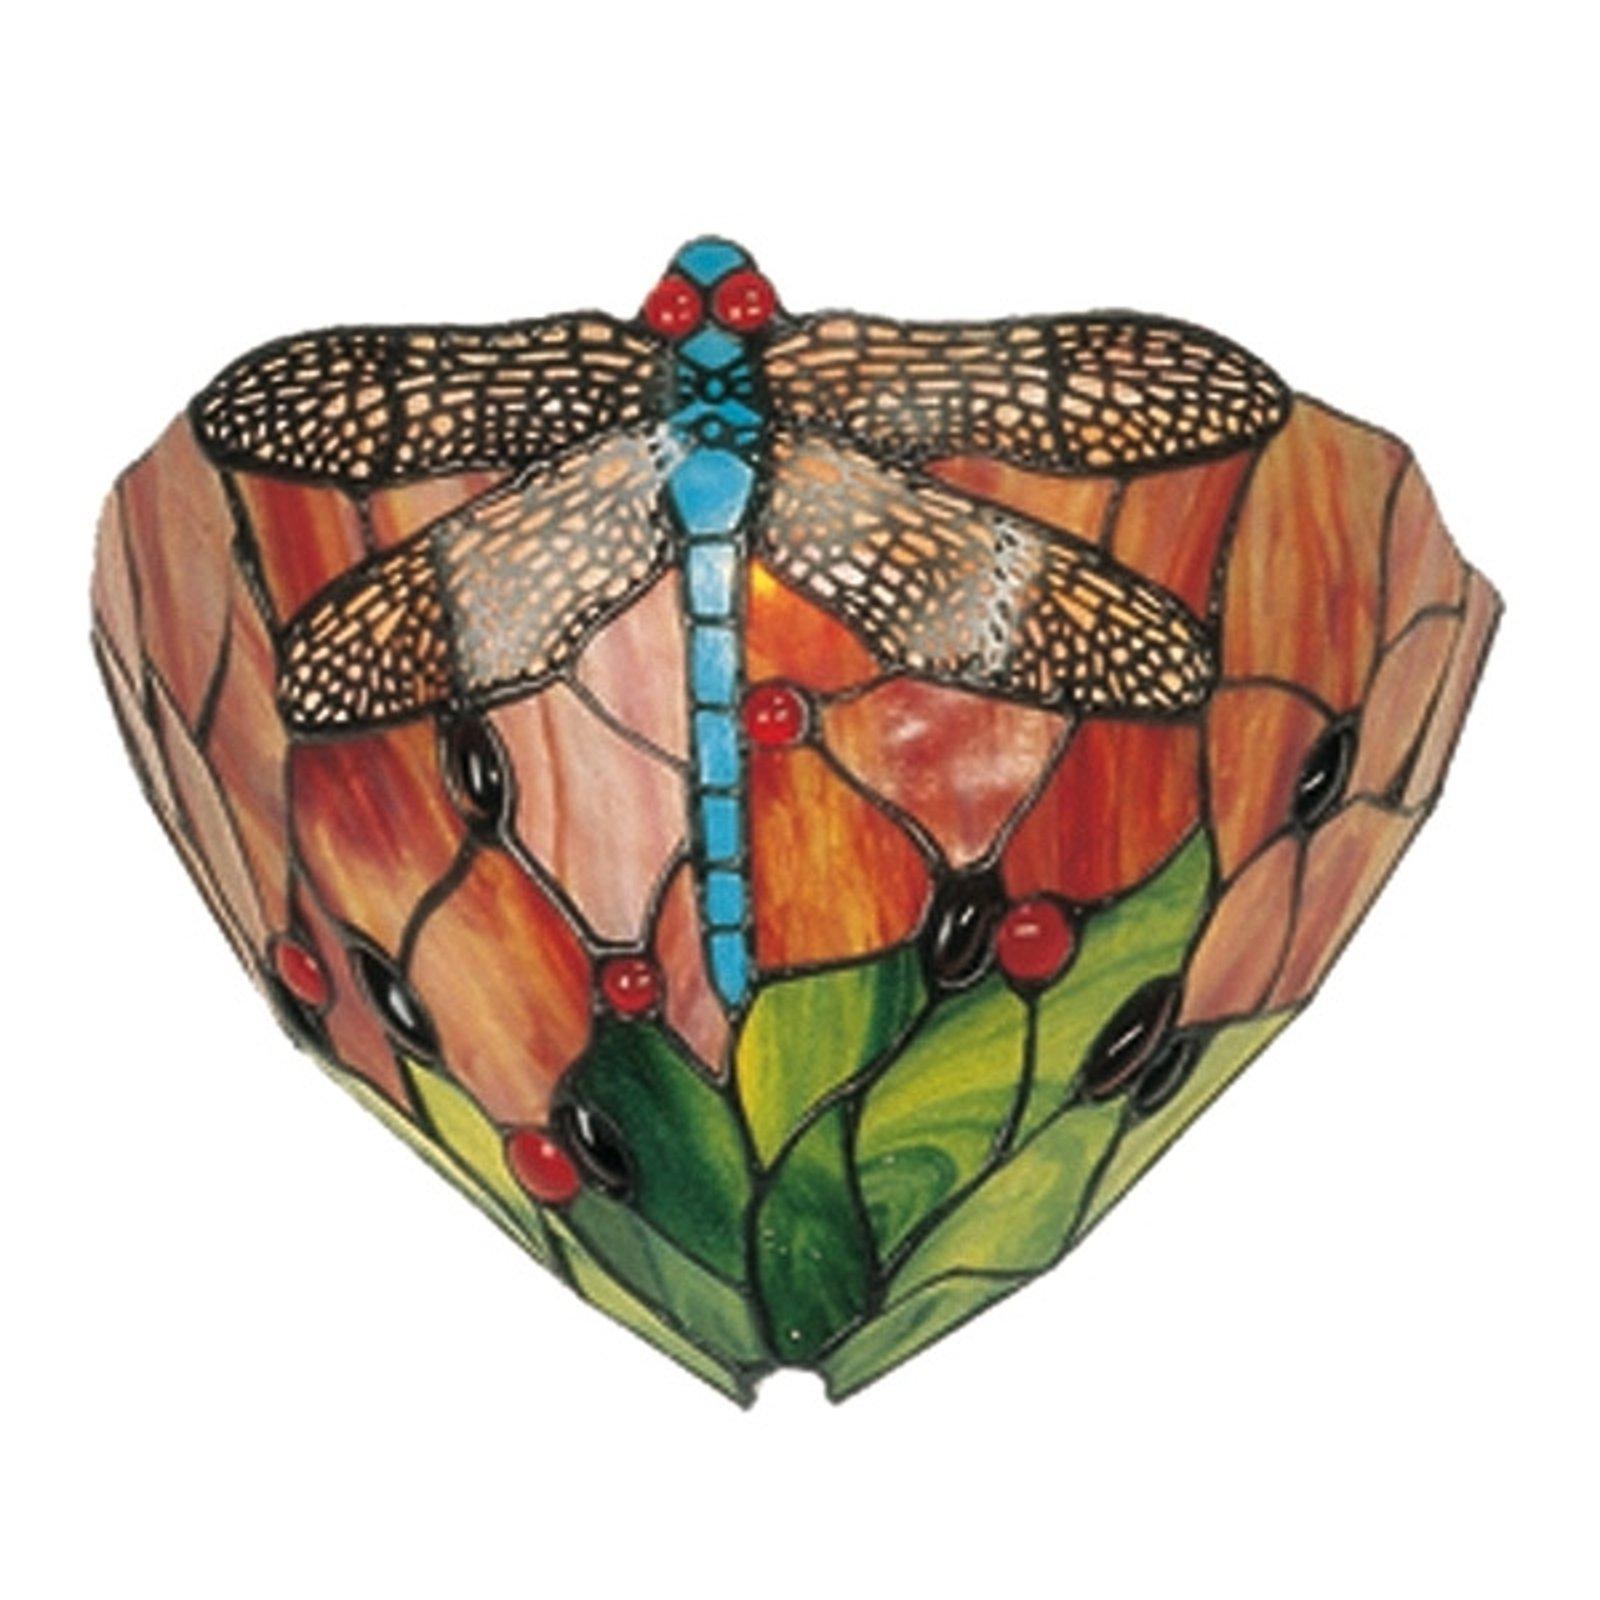 Fairytale - vegglampe i naturlige fargetoner